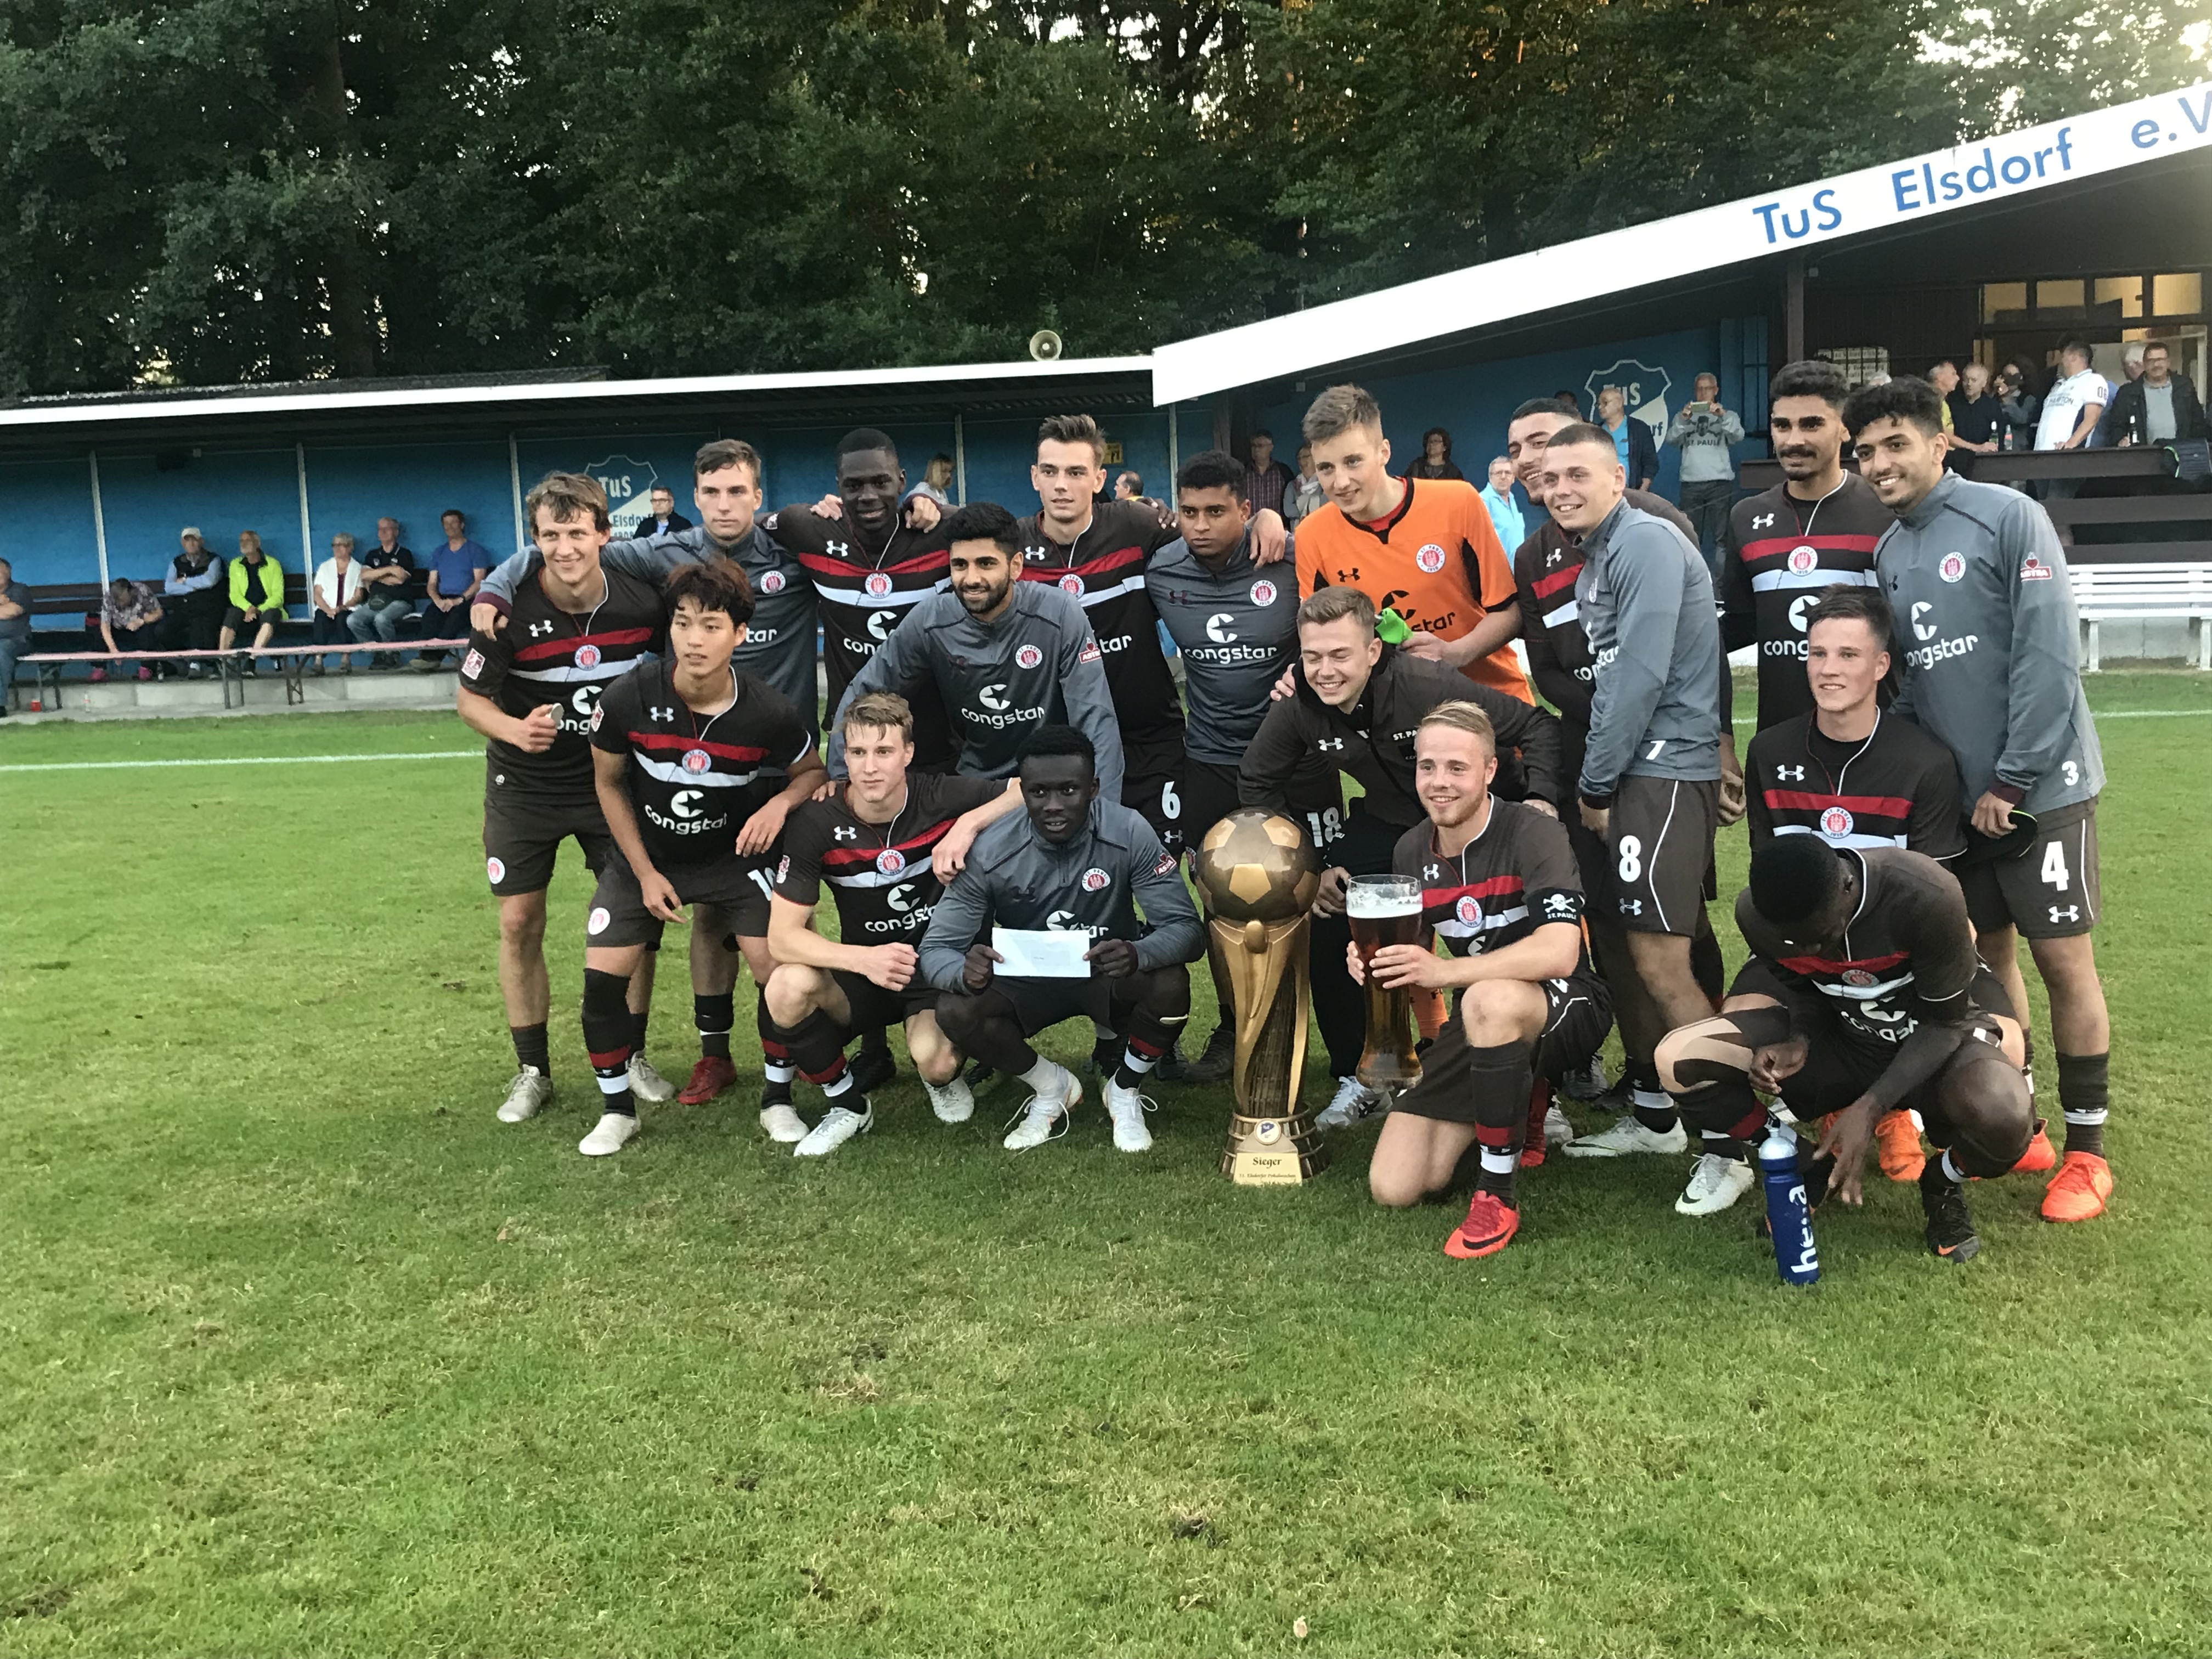 3:1 gegen Heeslingen: U23 gewinnt die Elsdorfer Pokalwochen